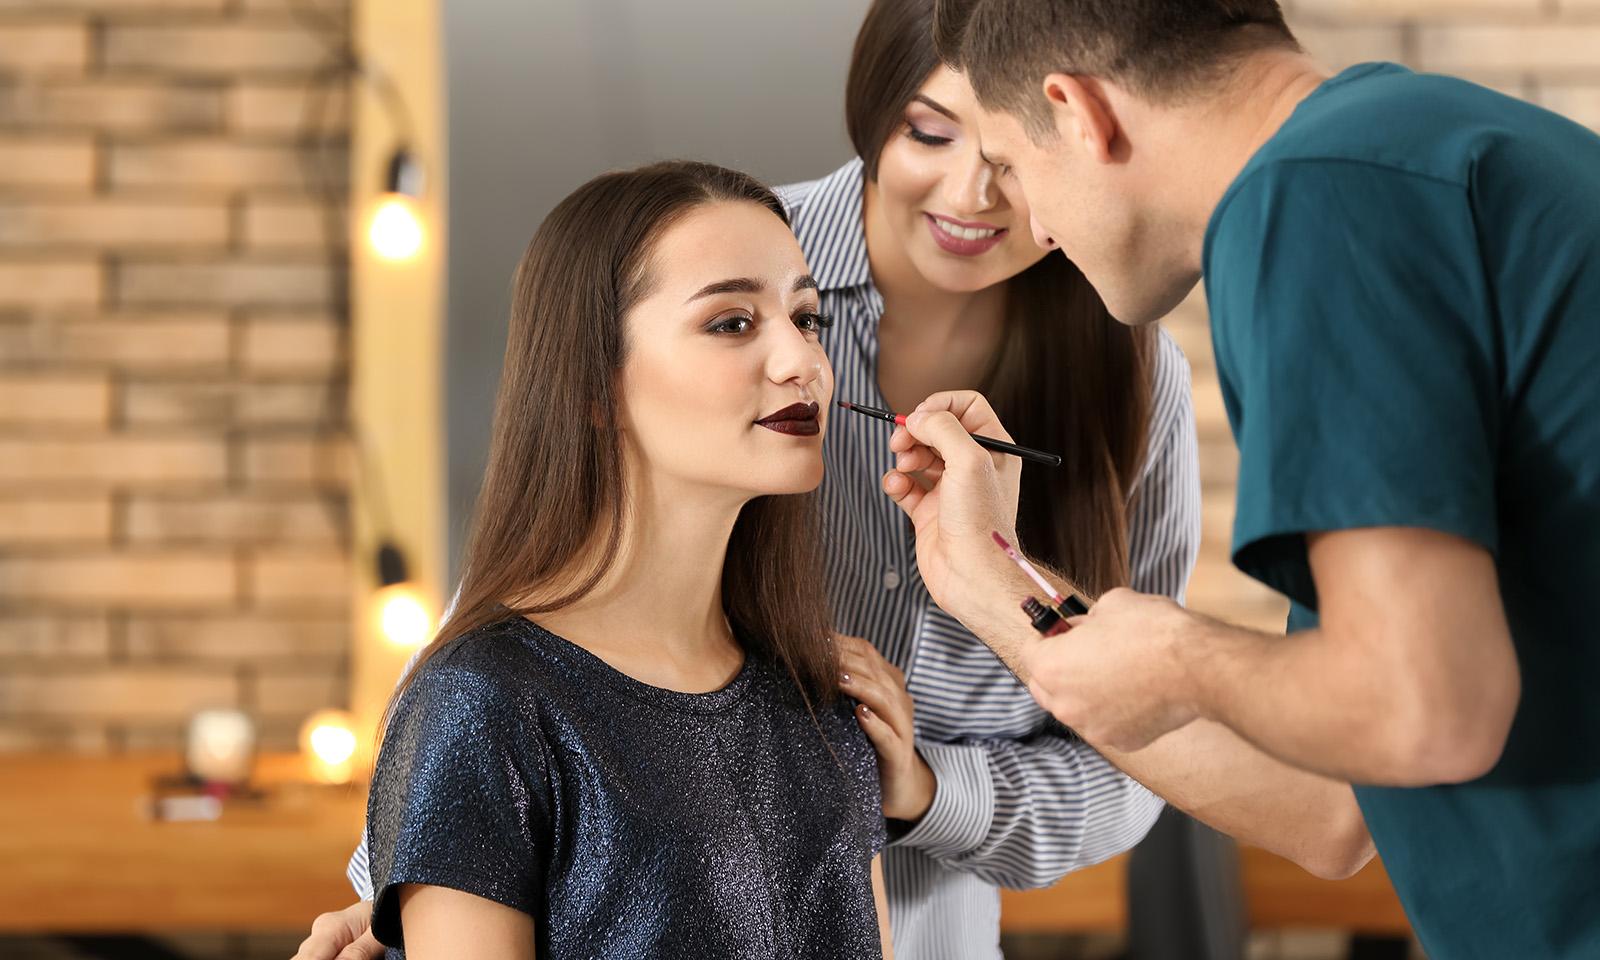 do-silicone-makup-brushes-work-artist-applying-lipstick-on-model